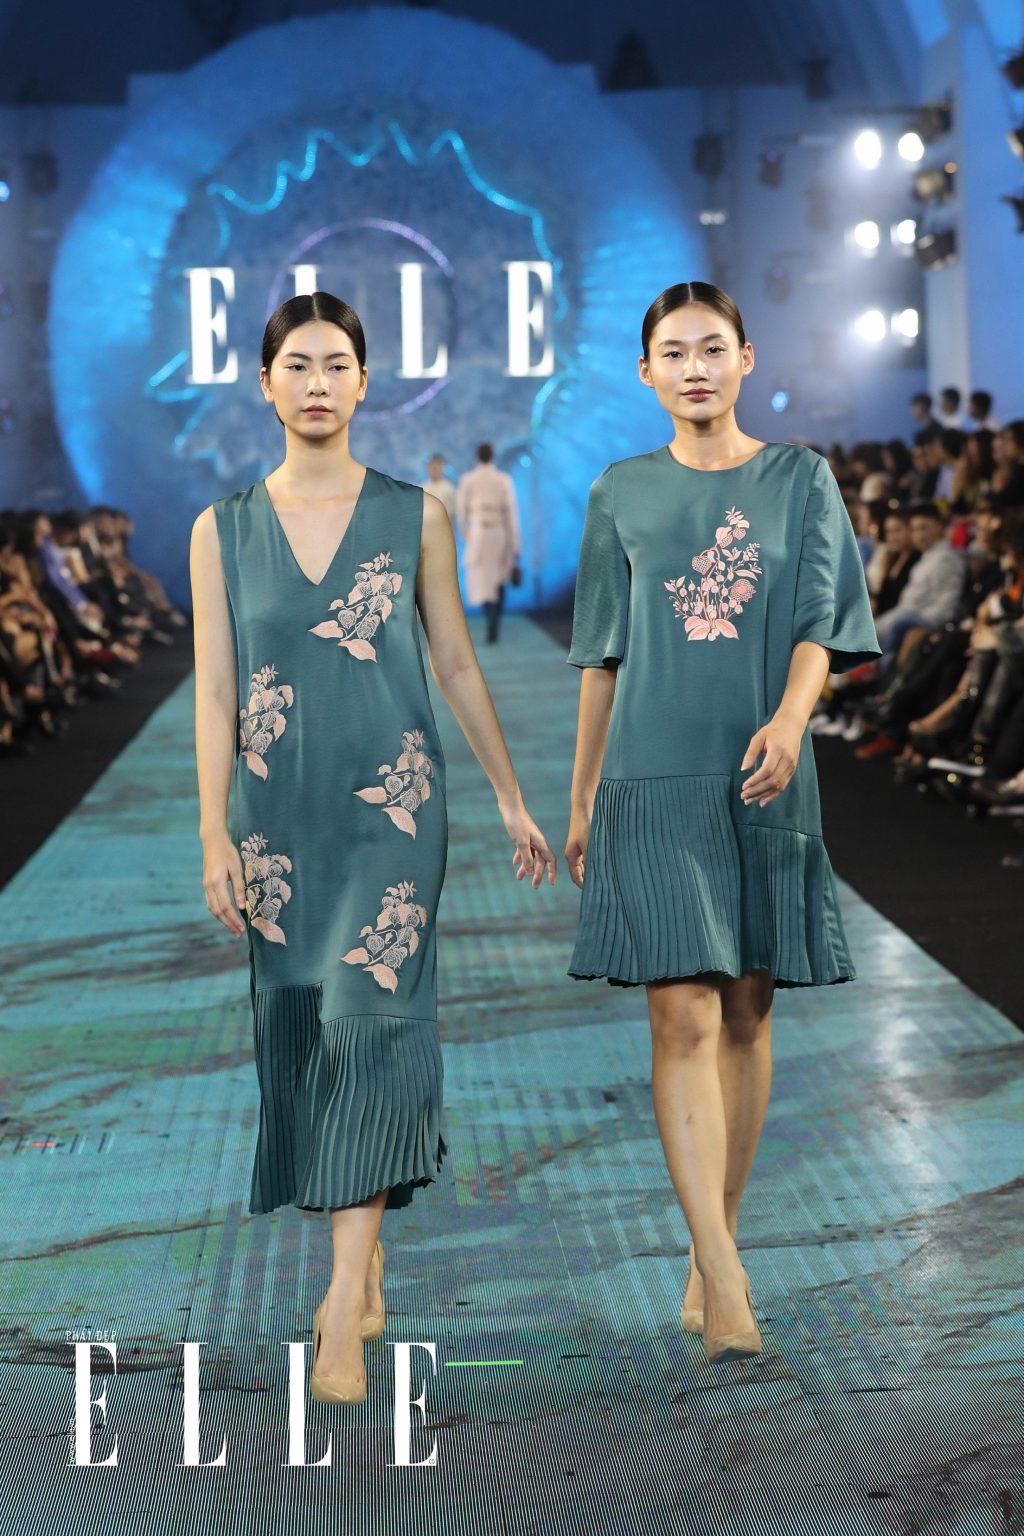 xu huong trang diem thong linh san dien elle fashion journey 2018 02